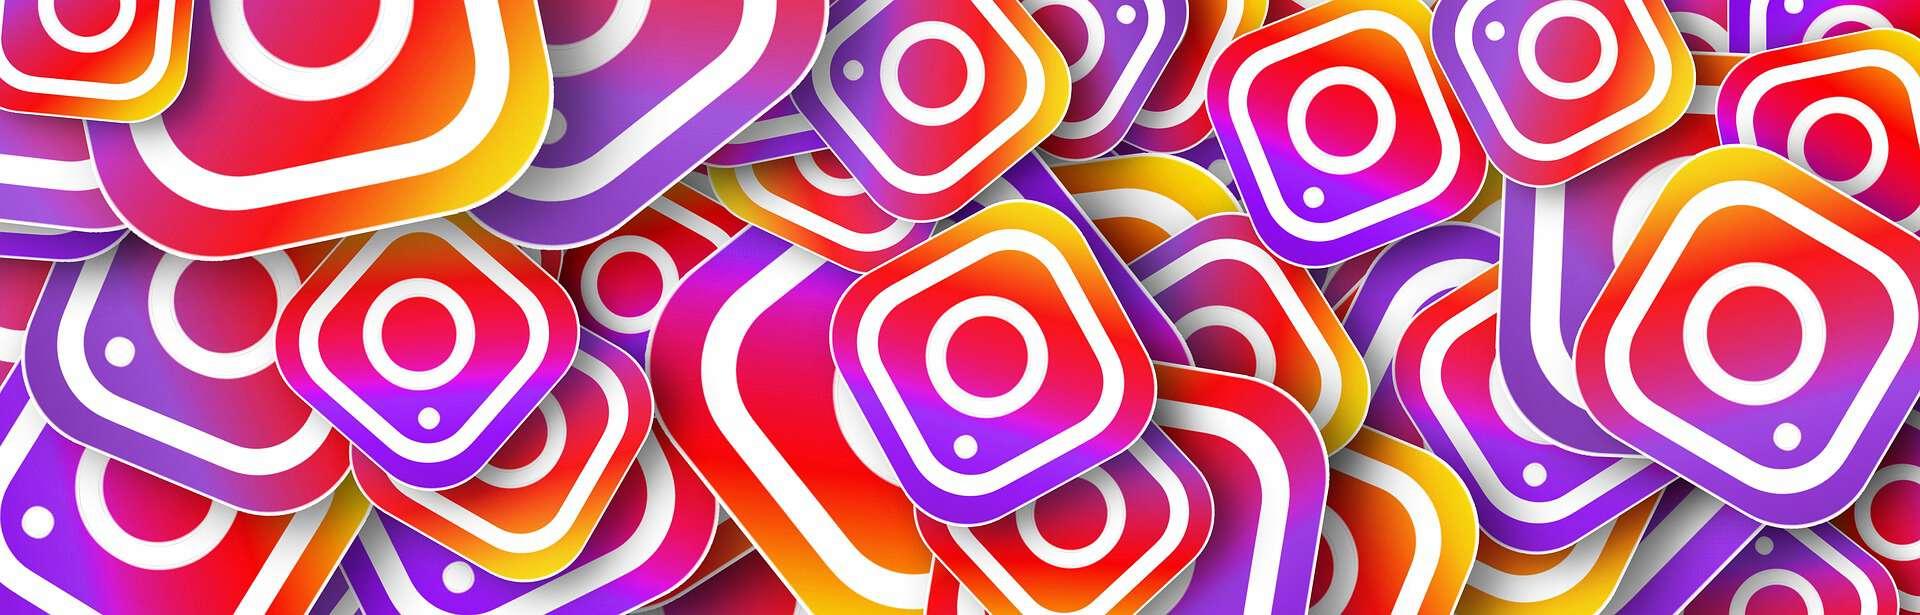 Denta Marketingl Instagram Account